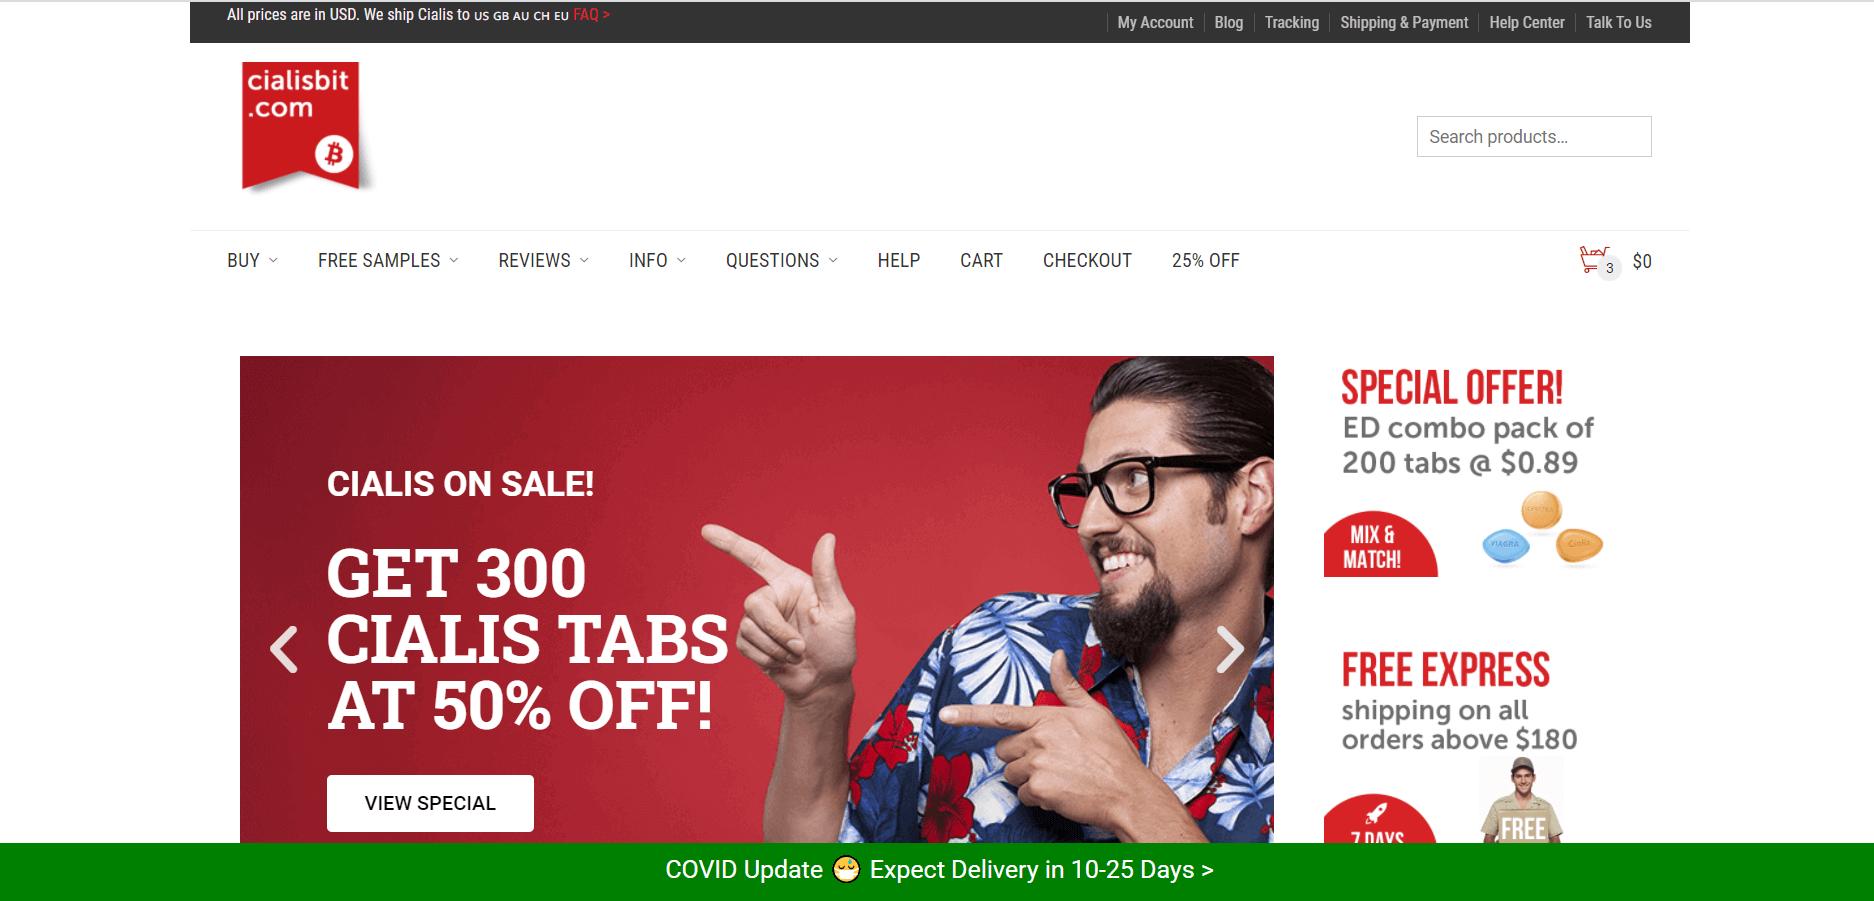 CialisBit.com